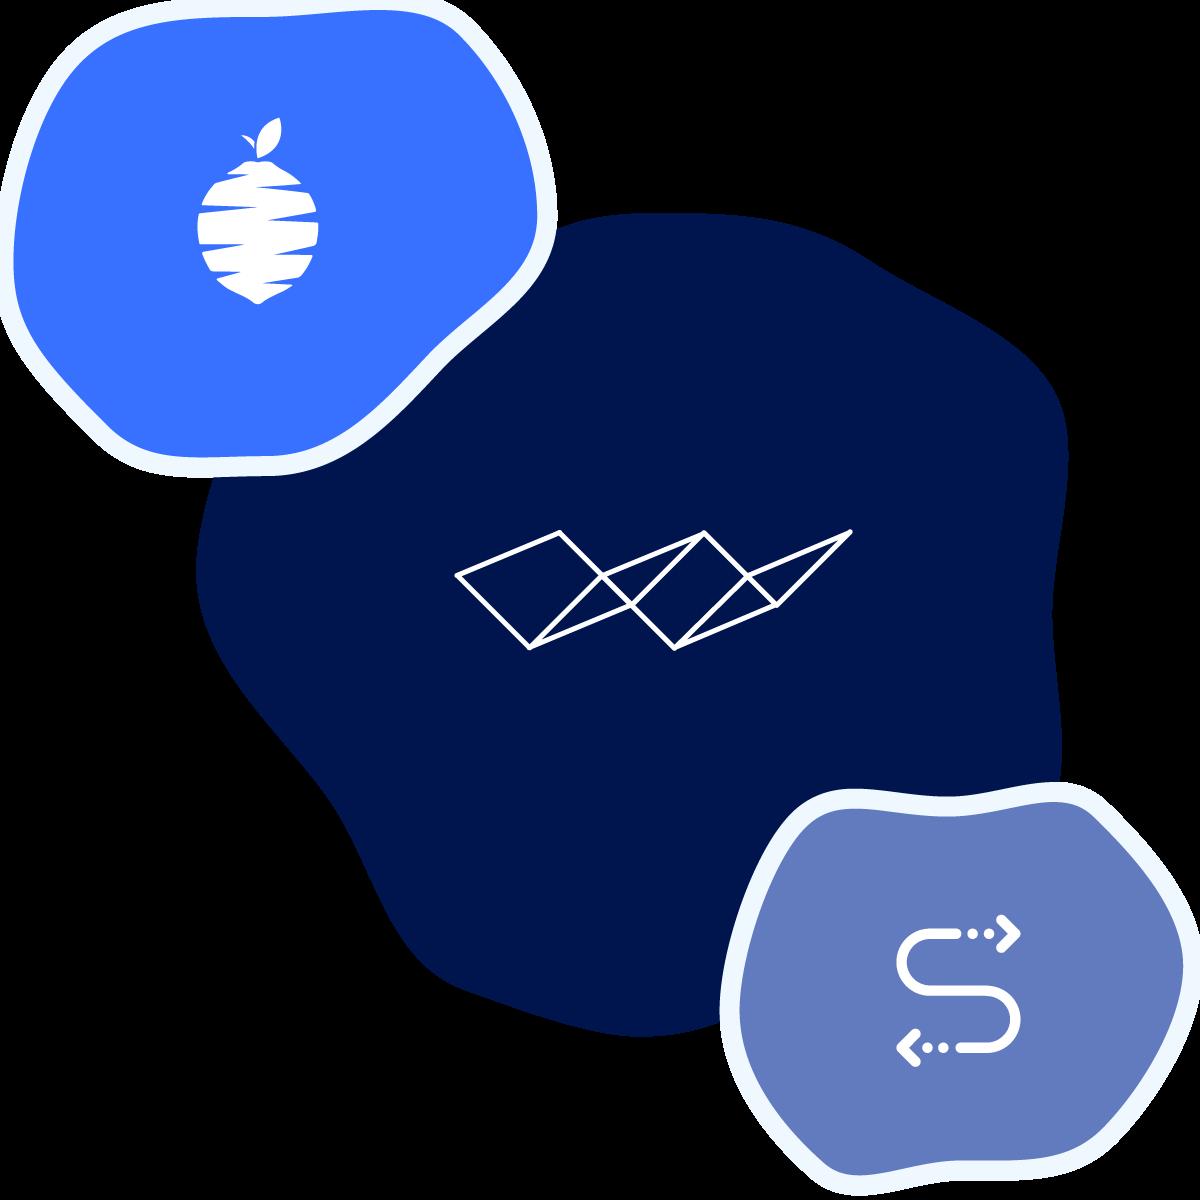 Logo Interne Bedrijven